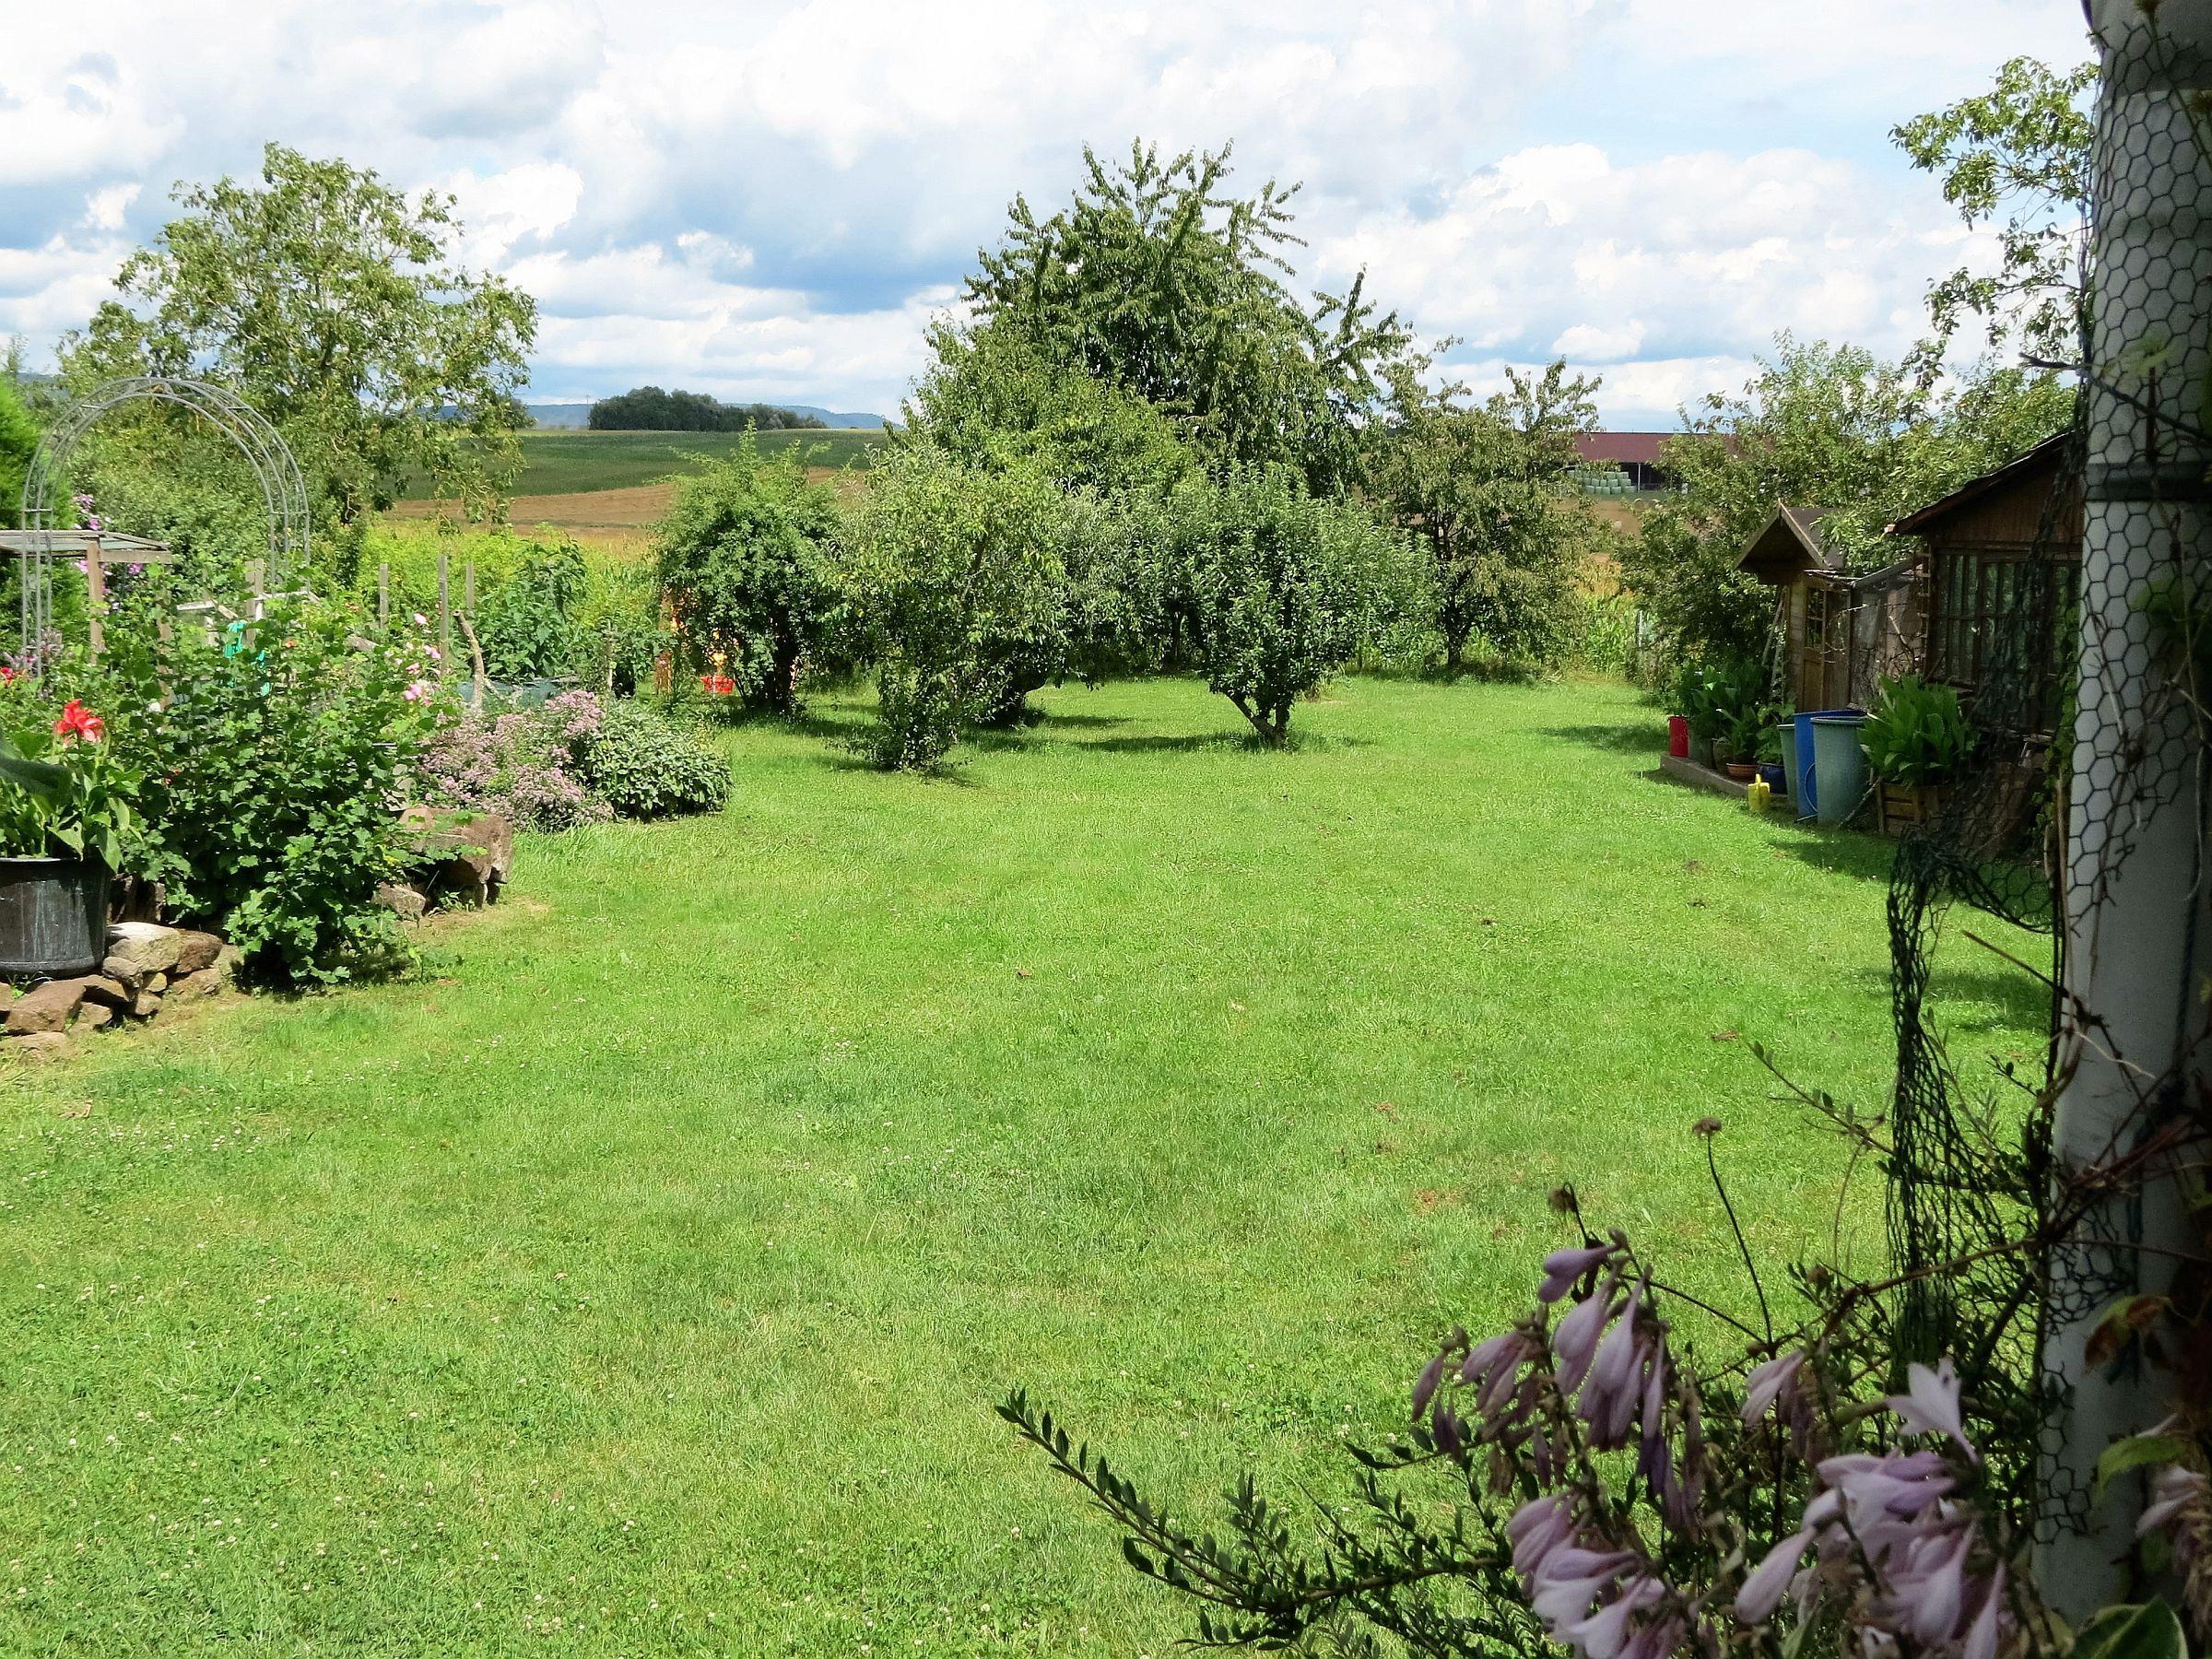 Alojamiento para 3 personas con jardín